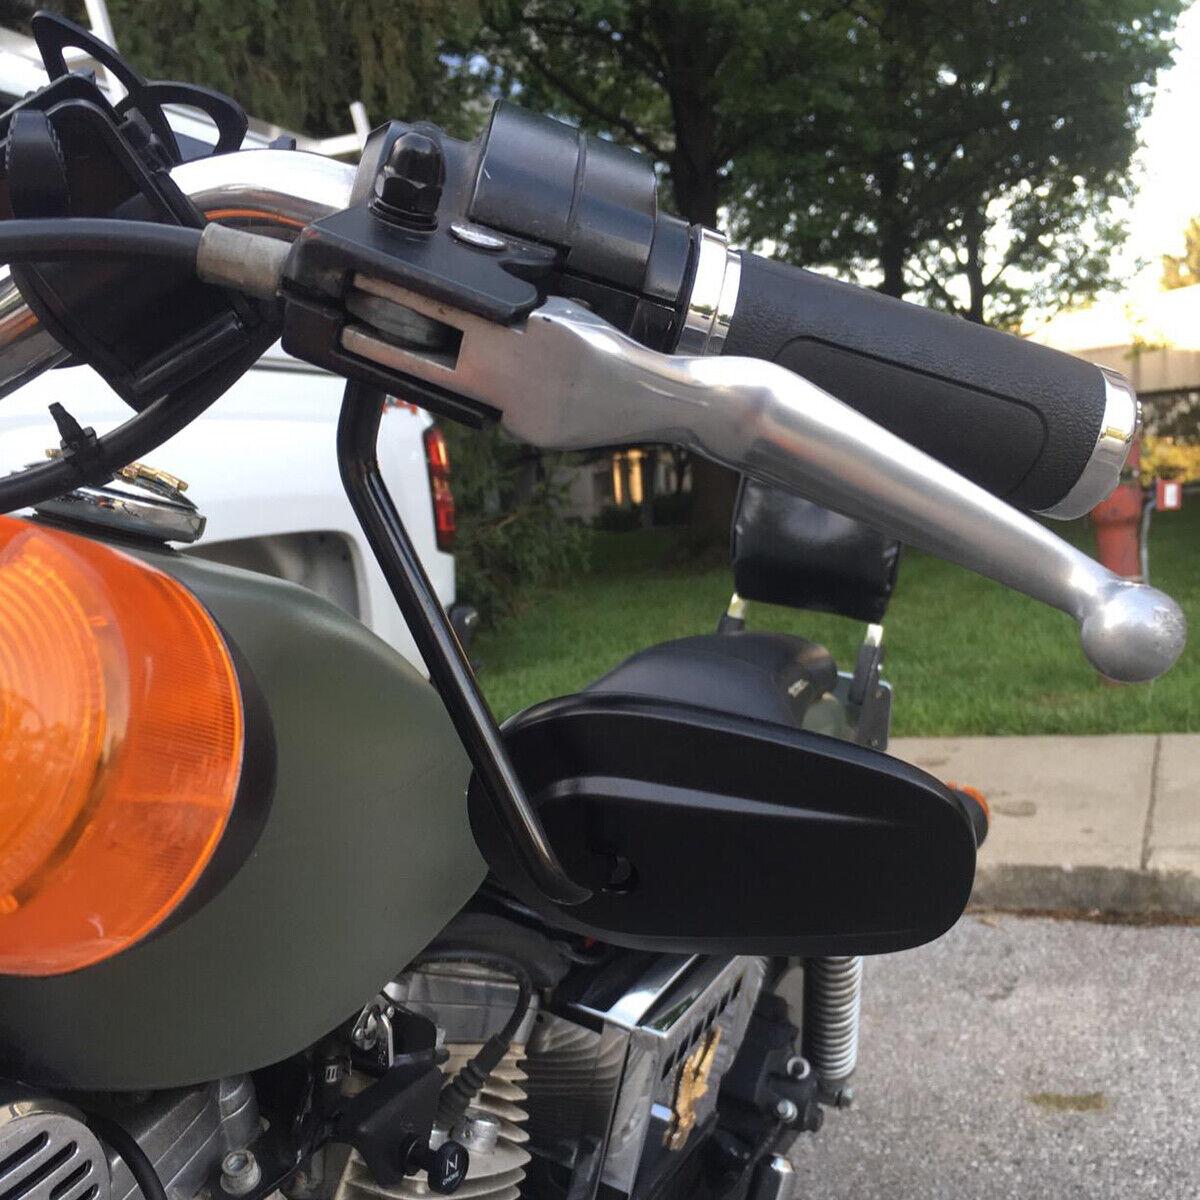 Motorcycle Motobike Classic Round Mirrors For Harley Cruiser Bobber Chopper